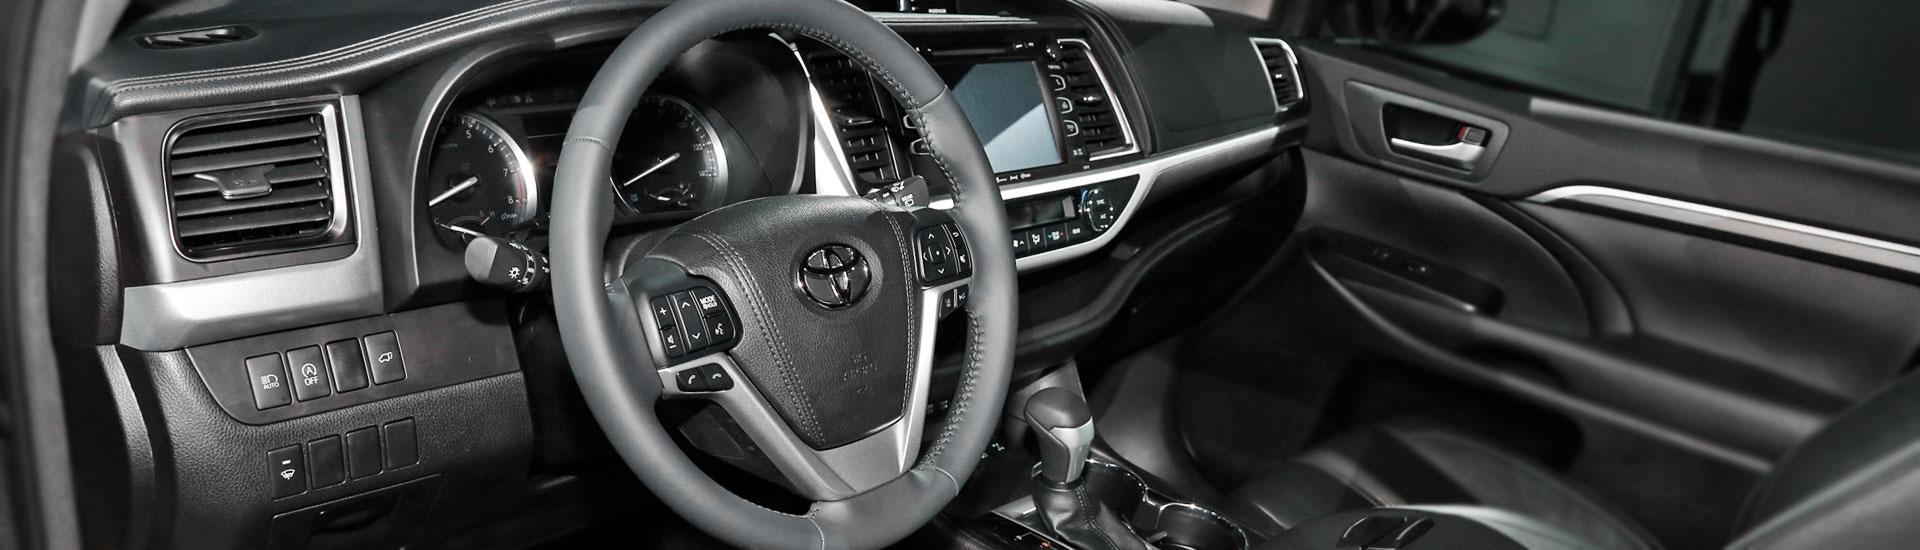 Toyota Highlander Dash Kits Custom Toyota Highlander Dash Kit